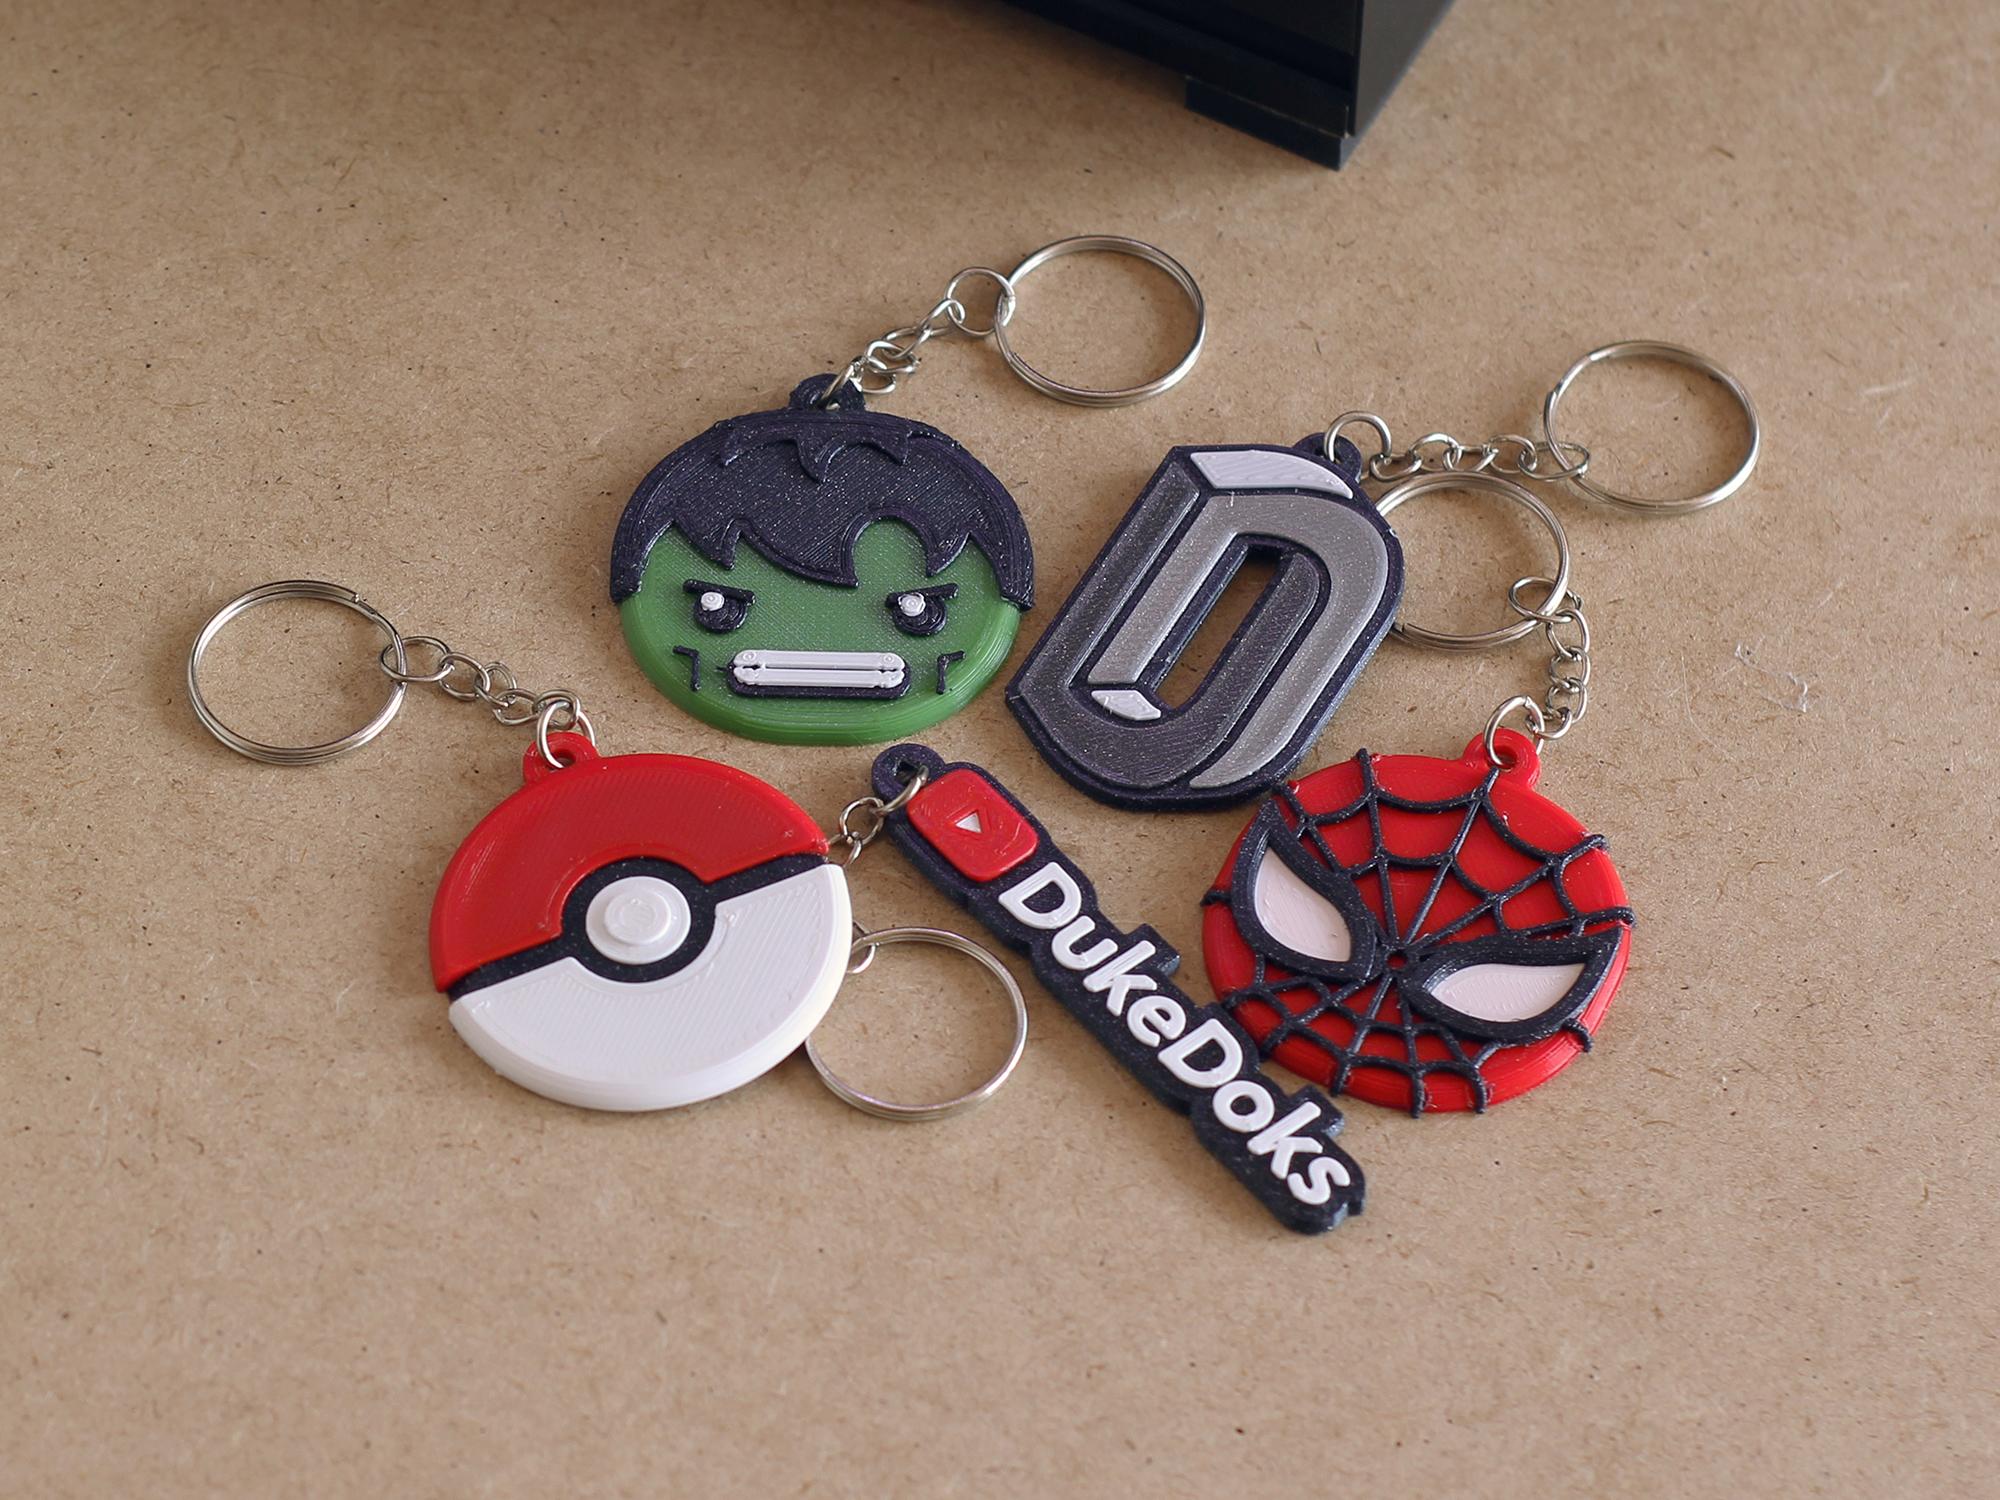 Miniaturas thingiverse 09.jpg Download free STL file Keychain Multicolor Pokemon • 3D printer template, dukedoks